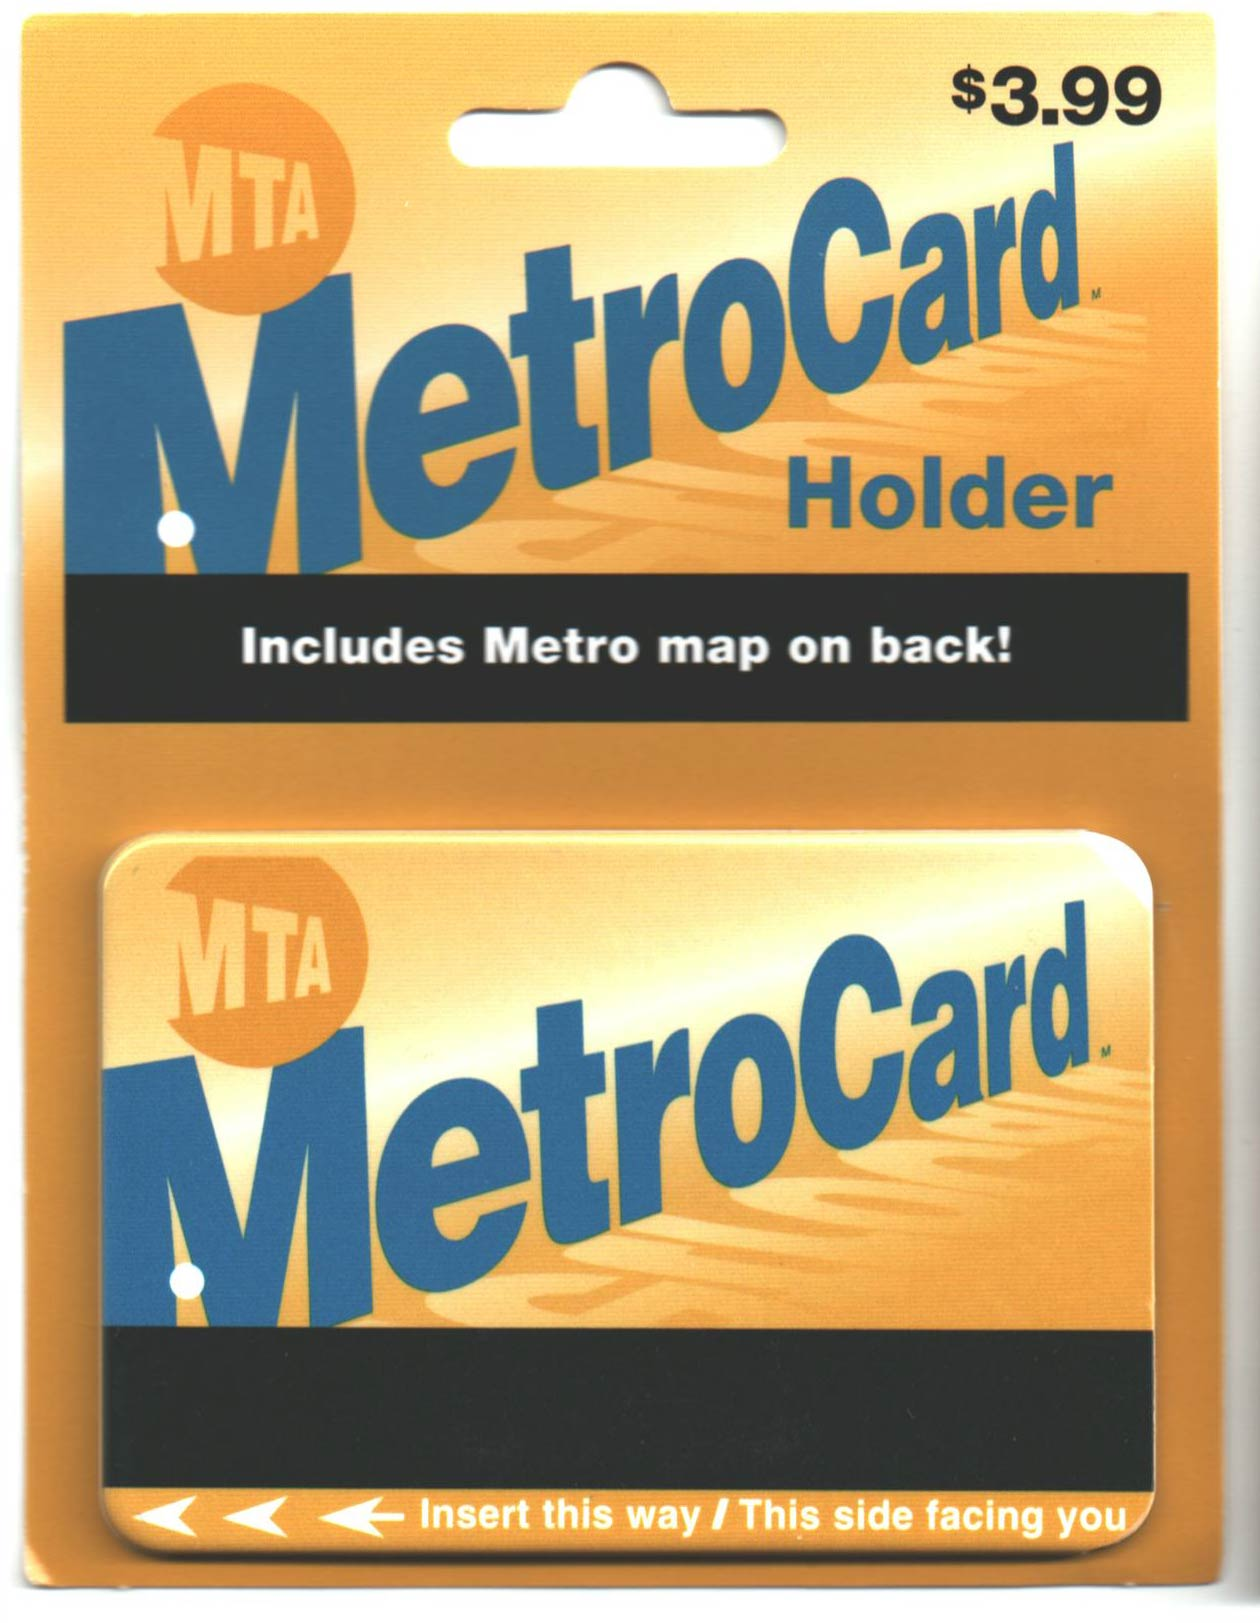 NY City Transit Metrocard Holder